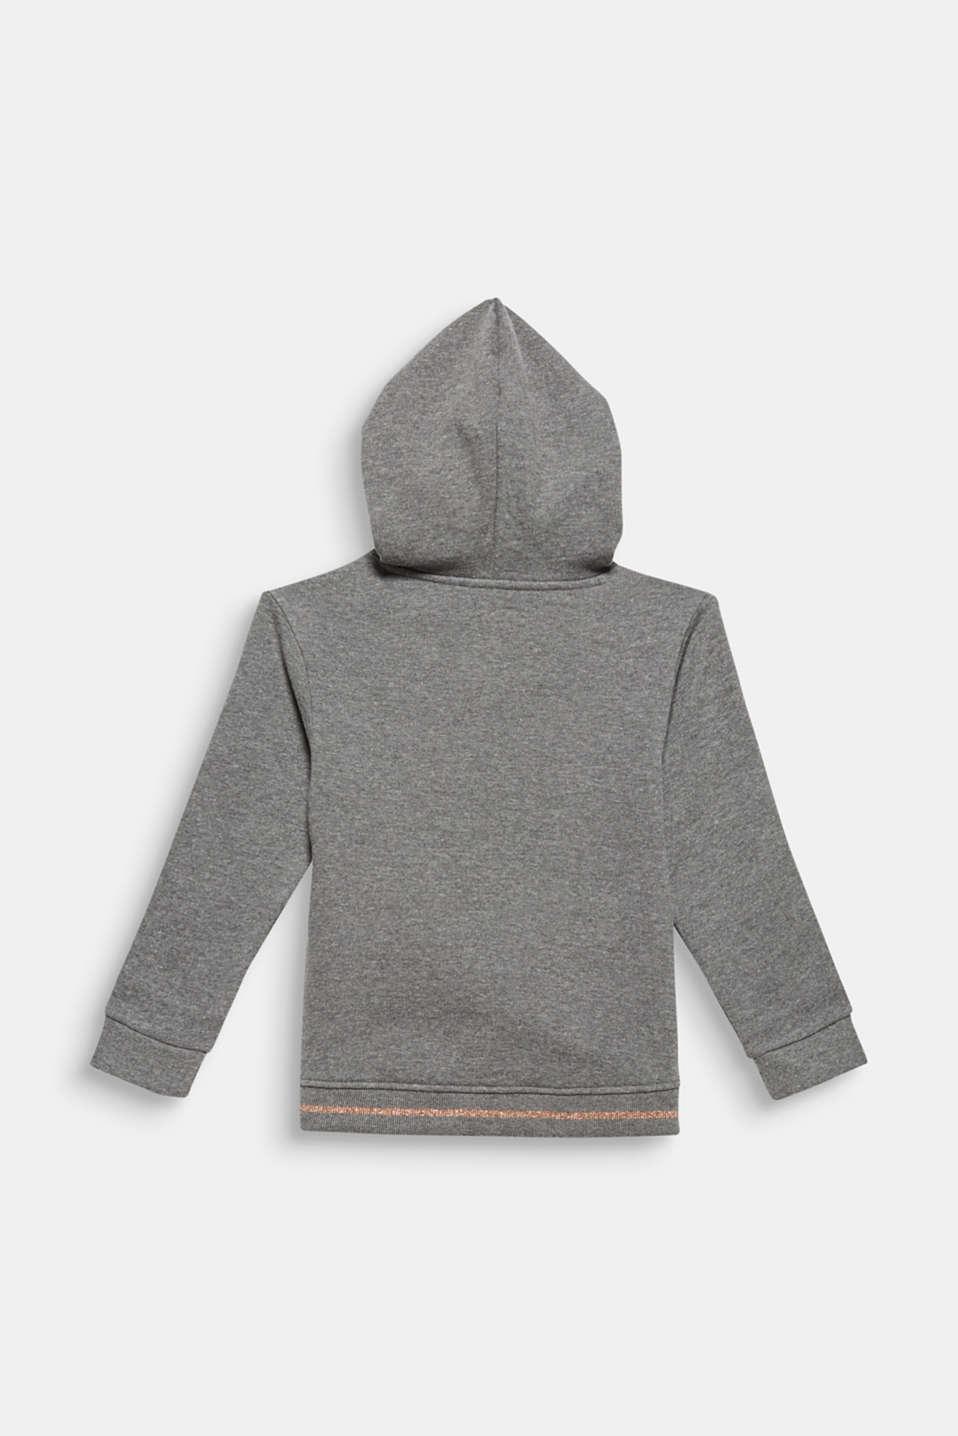 Sweatshirt fabric hoodie with glitter details, DARK HEATHER G, detail image number 1